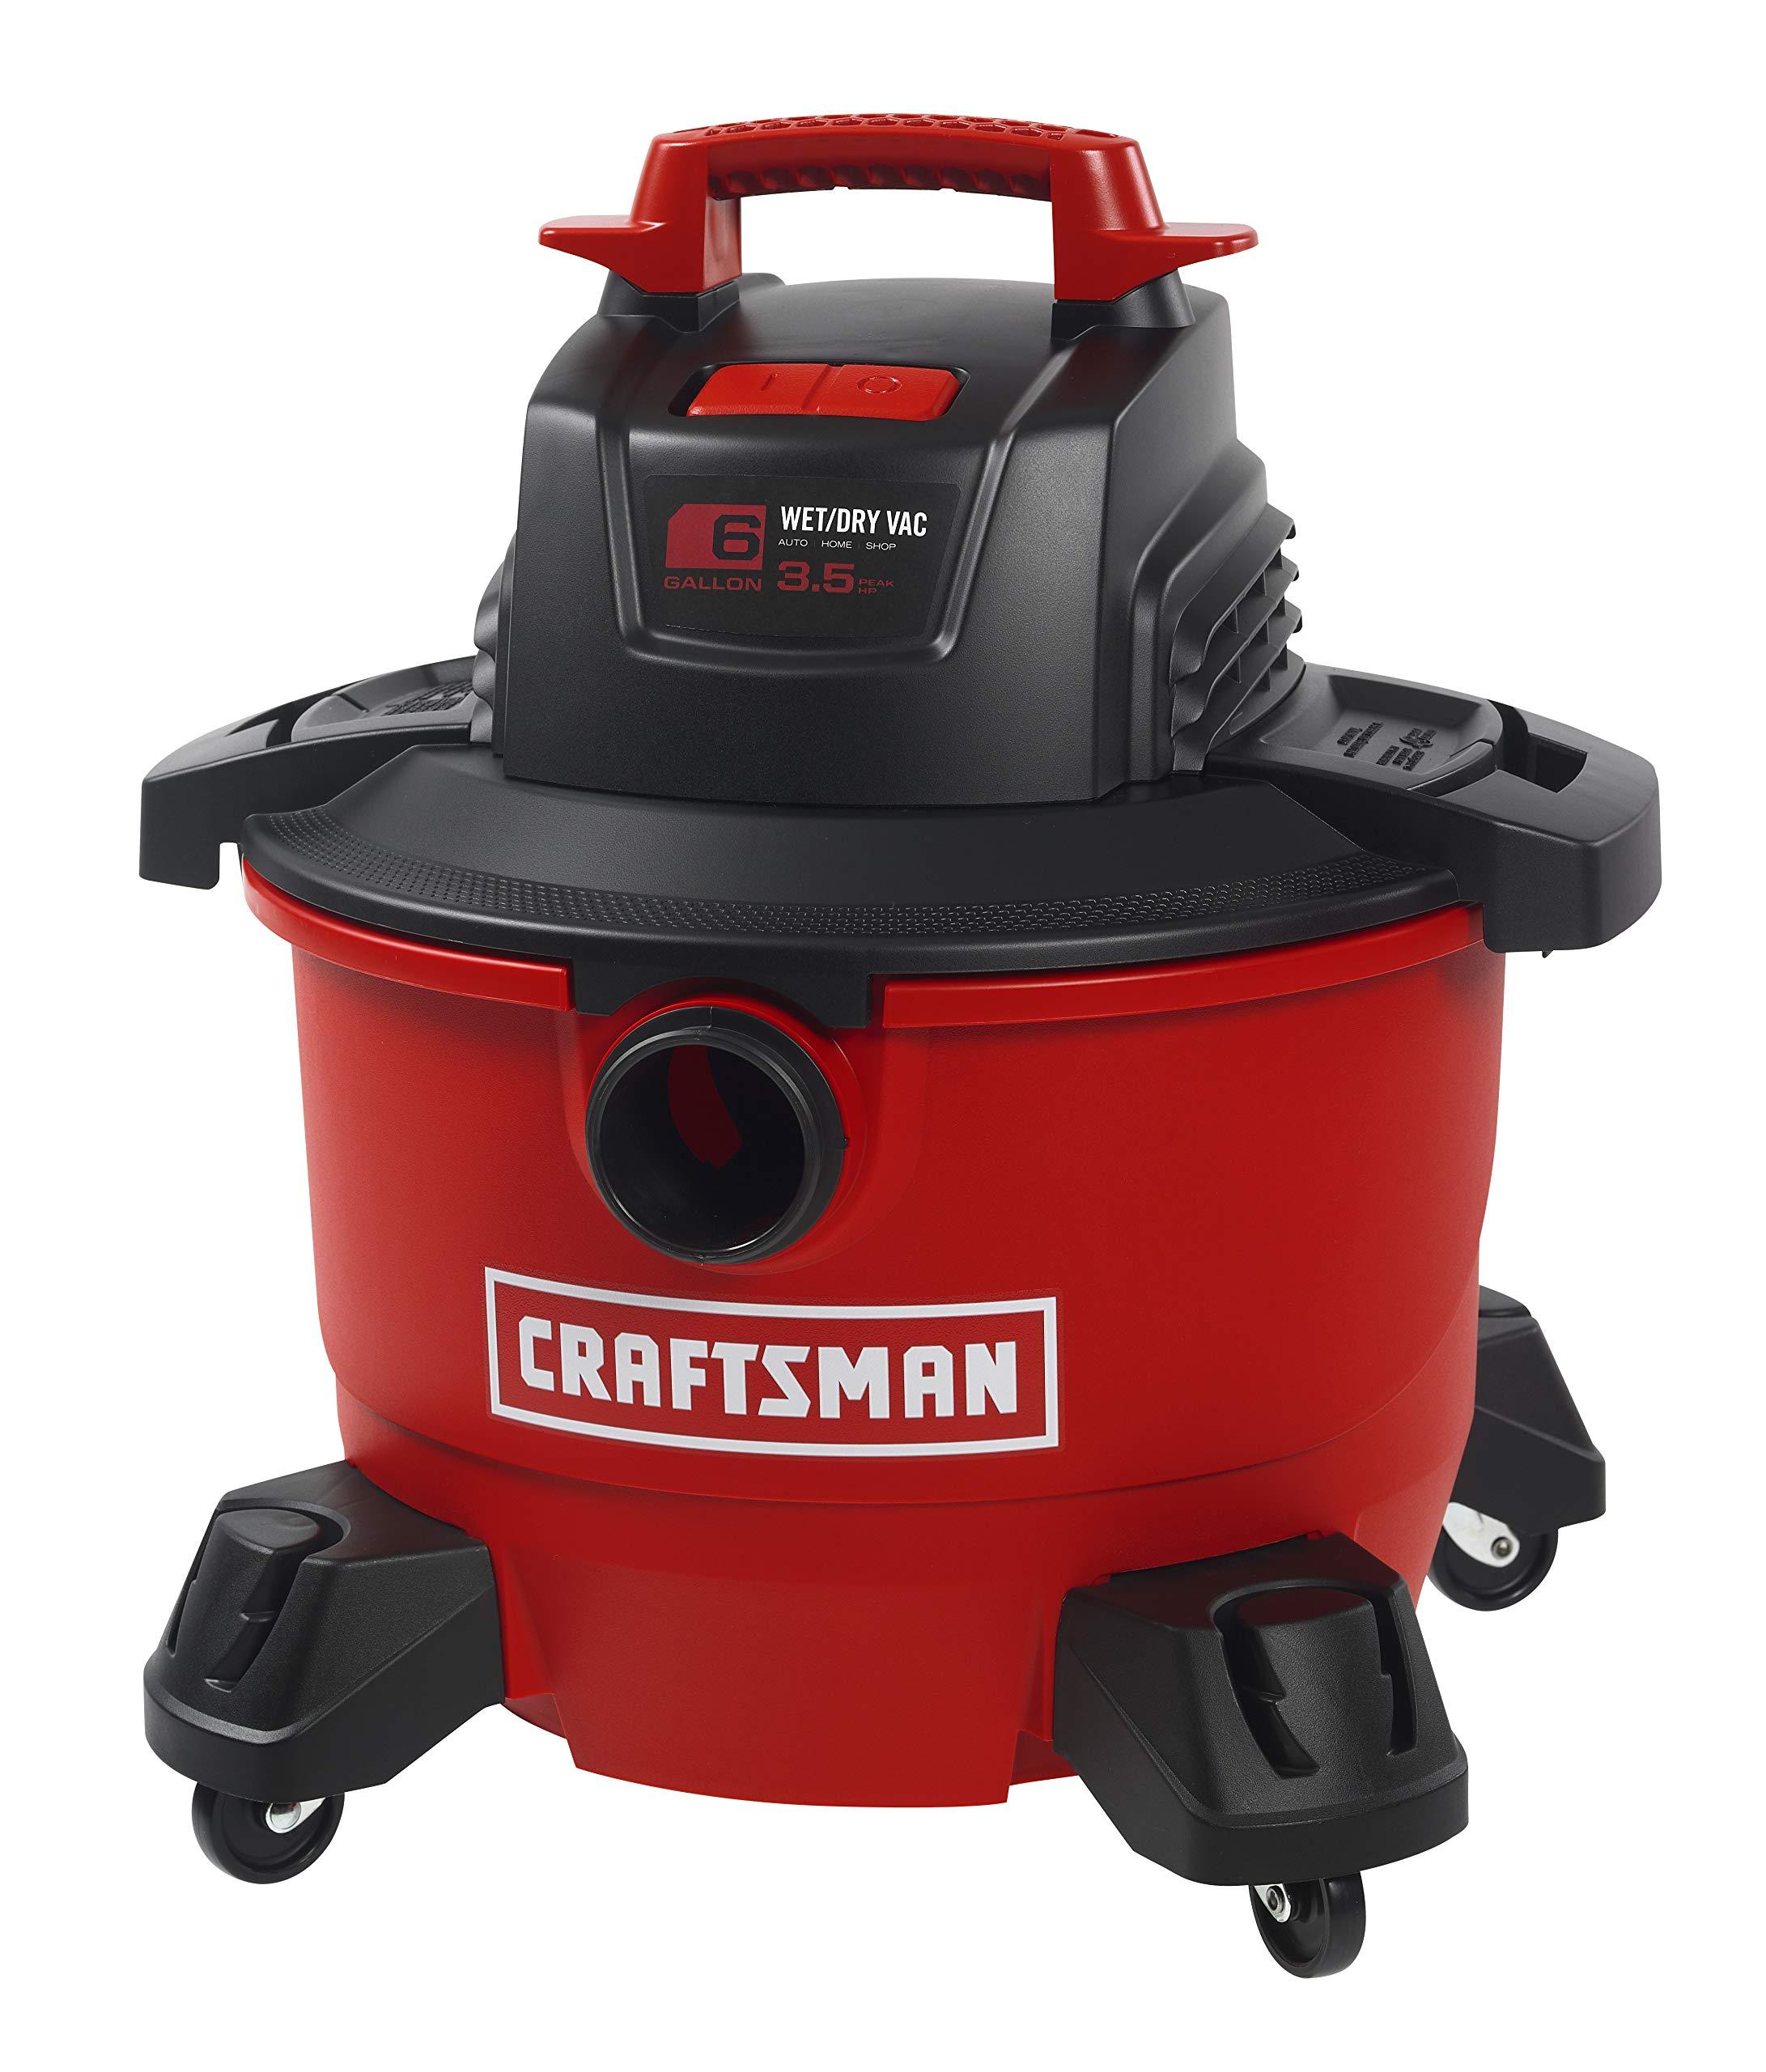 CRAFTSMAN 17584 6 Gallon 3.5 Peak HP Wet/Dry Vac, Portable Shop Vacuum with Attachments